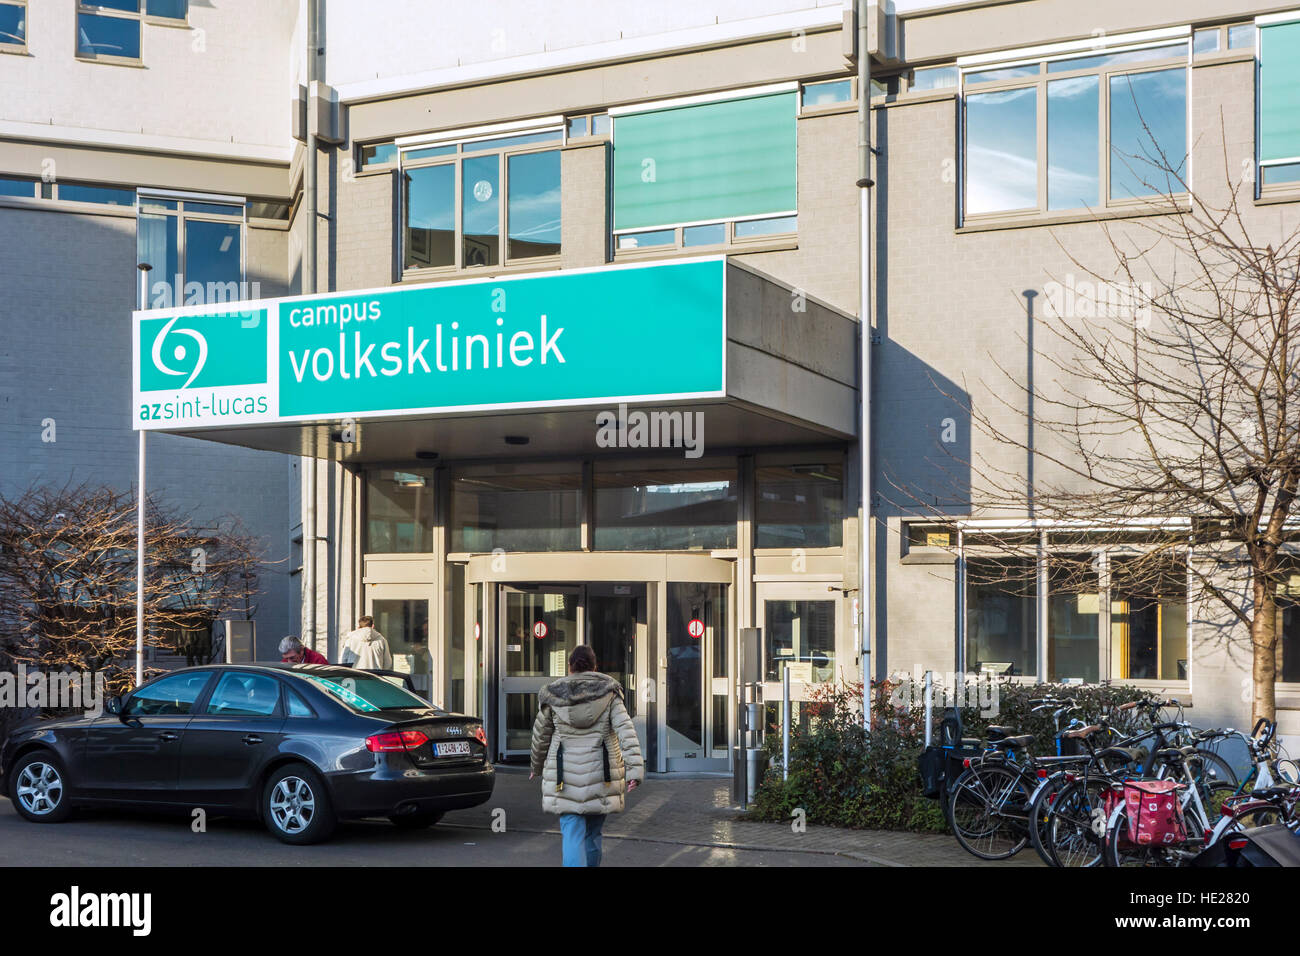 Entrance of the Hospital AZ Sint-Lucas Campus Volkskliniek in the city Ghent, East Flanders, Belgium - Stock Image